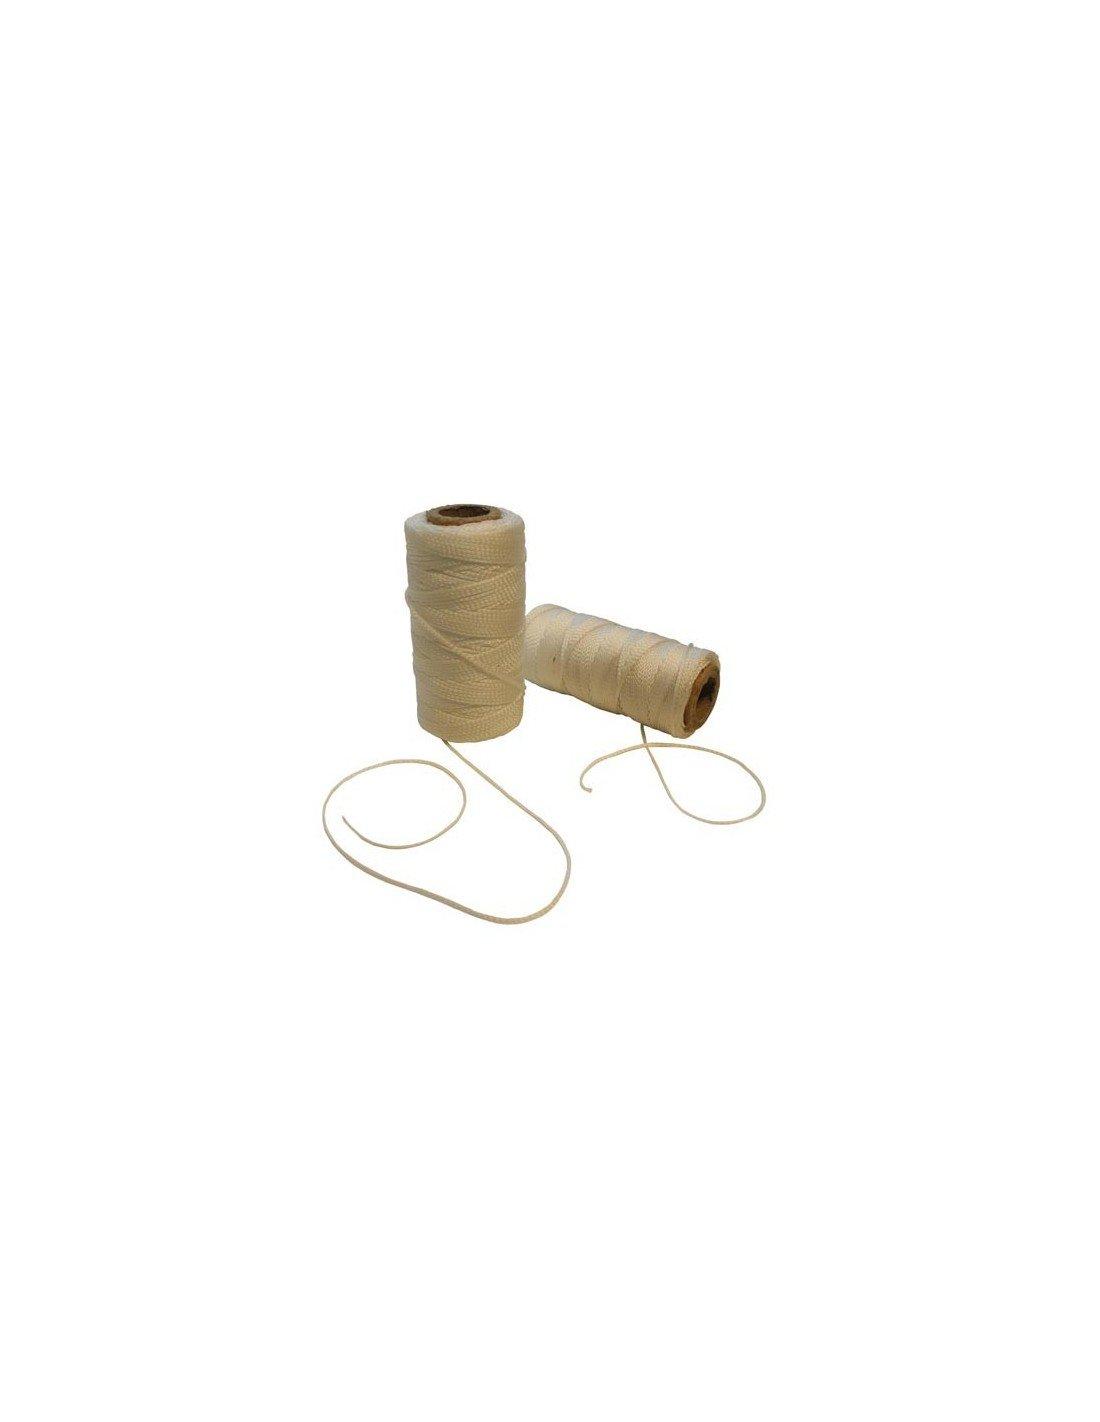 Perel HE949050 Corde de ma/çon 1,2 mm longueur 50 m